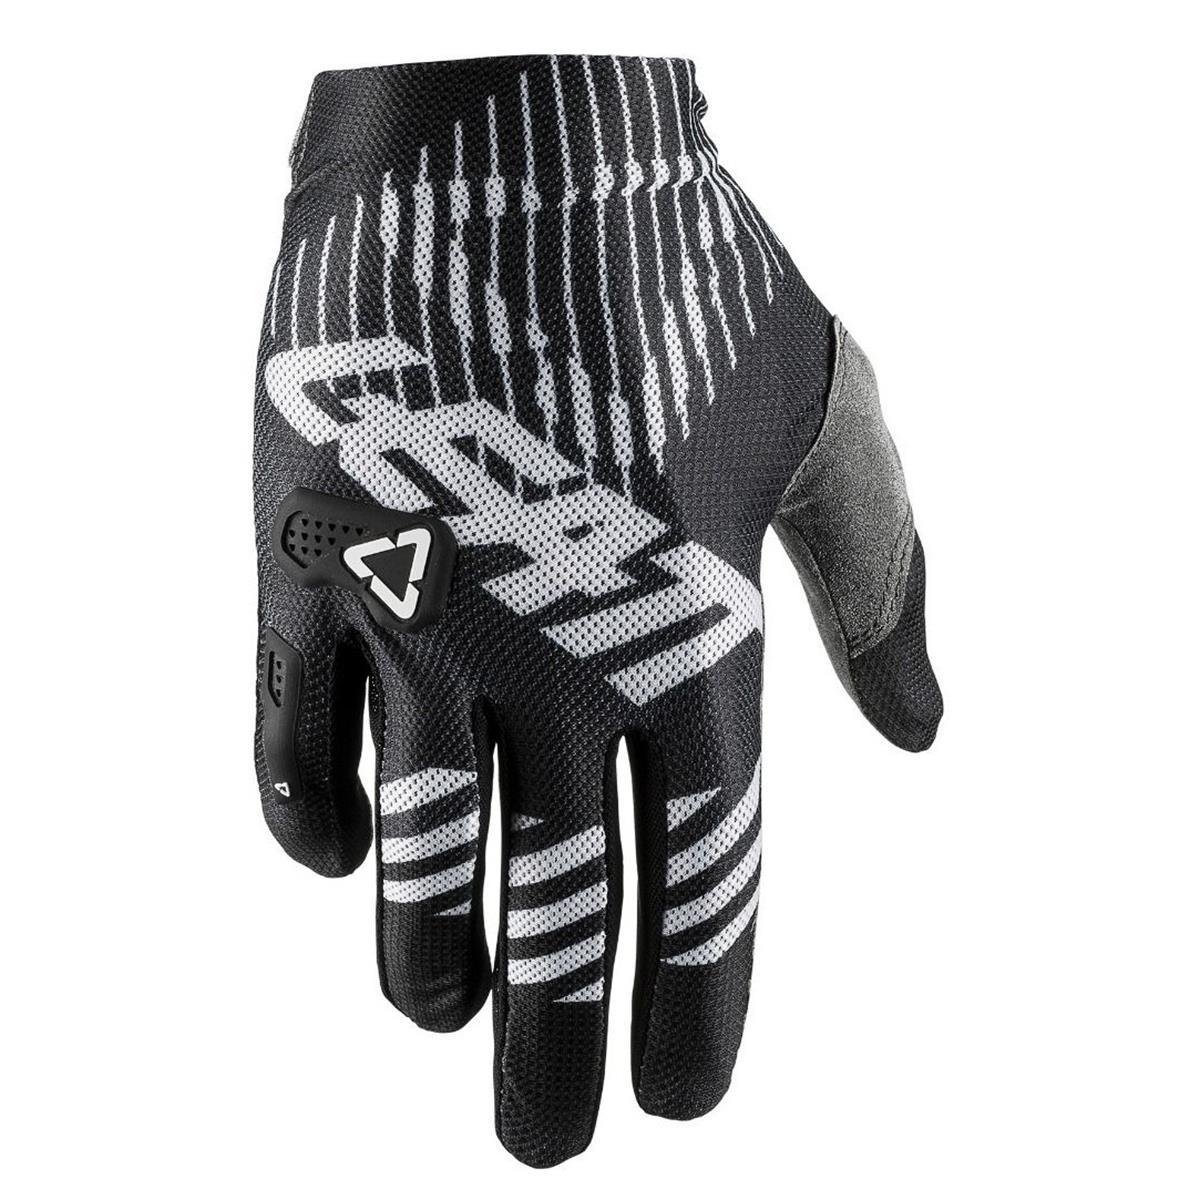 Leatt Handschuhe GPX 2.5 X-Flow Schwarz